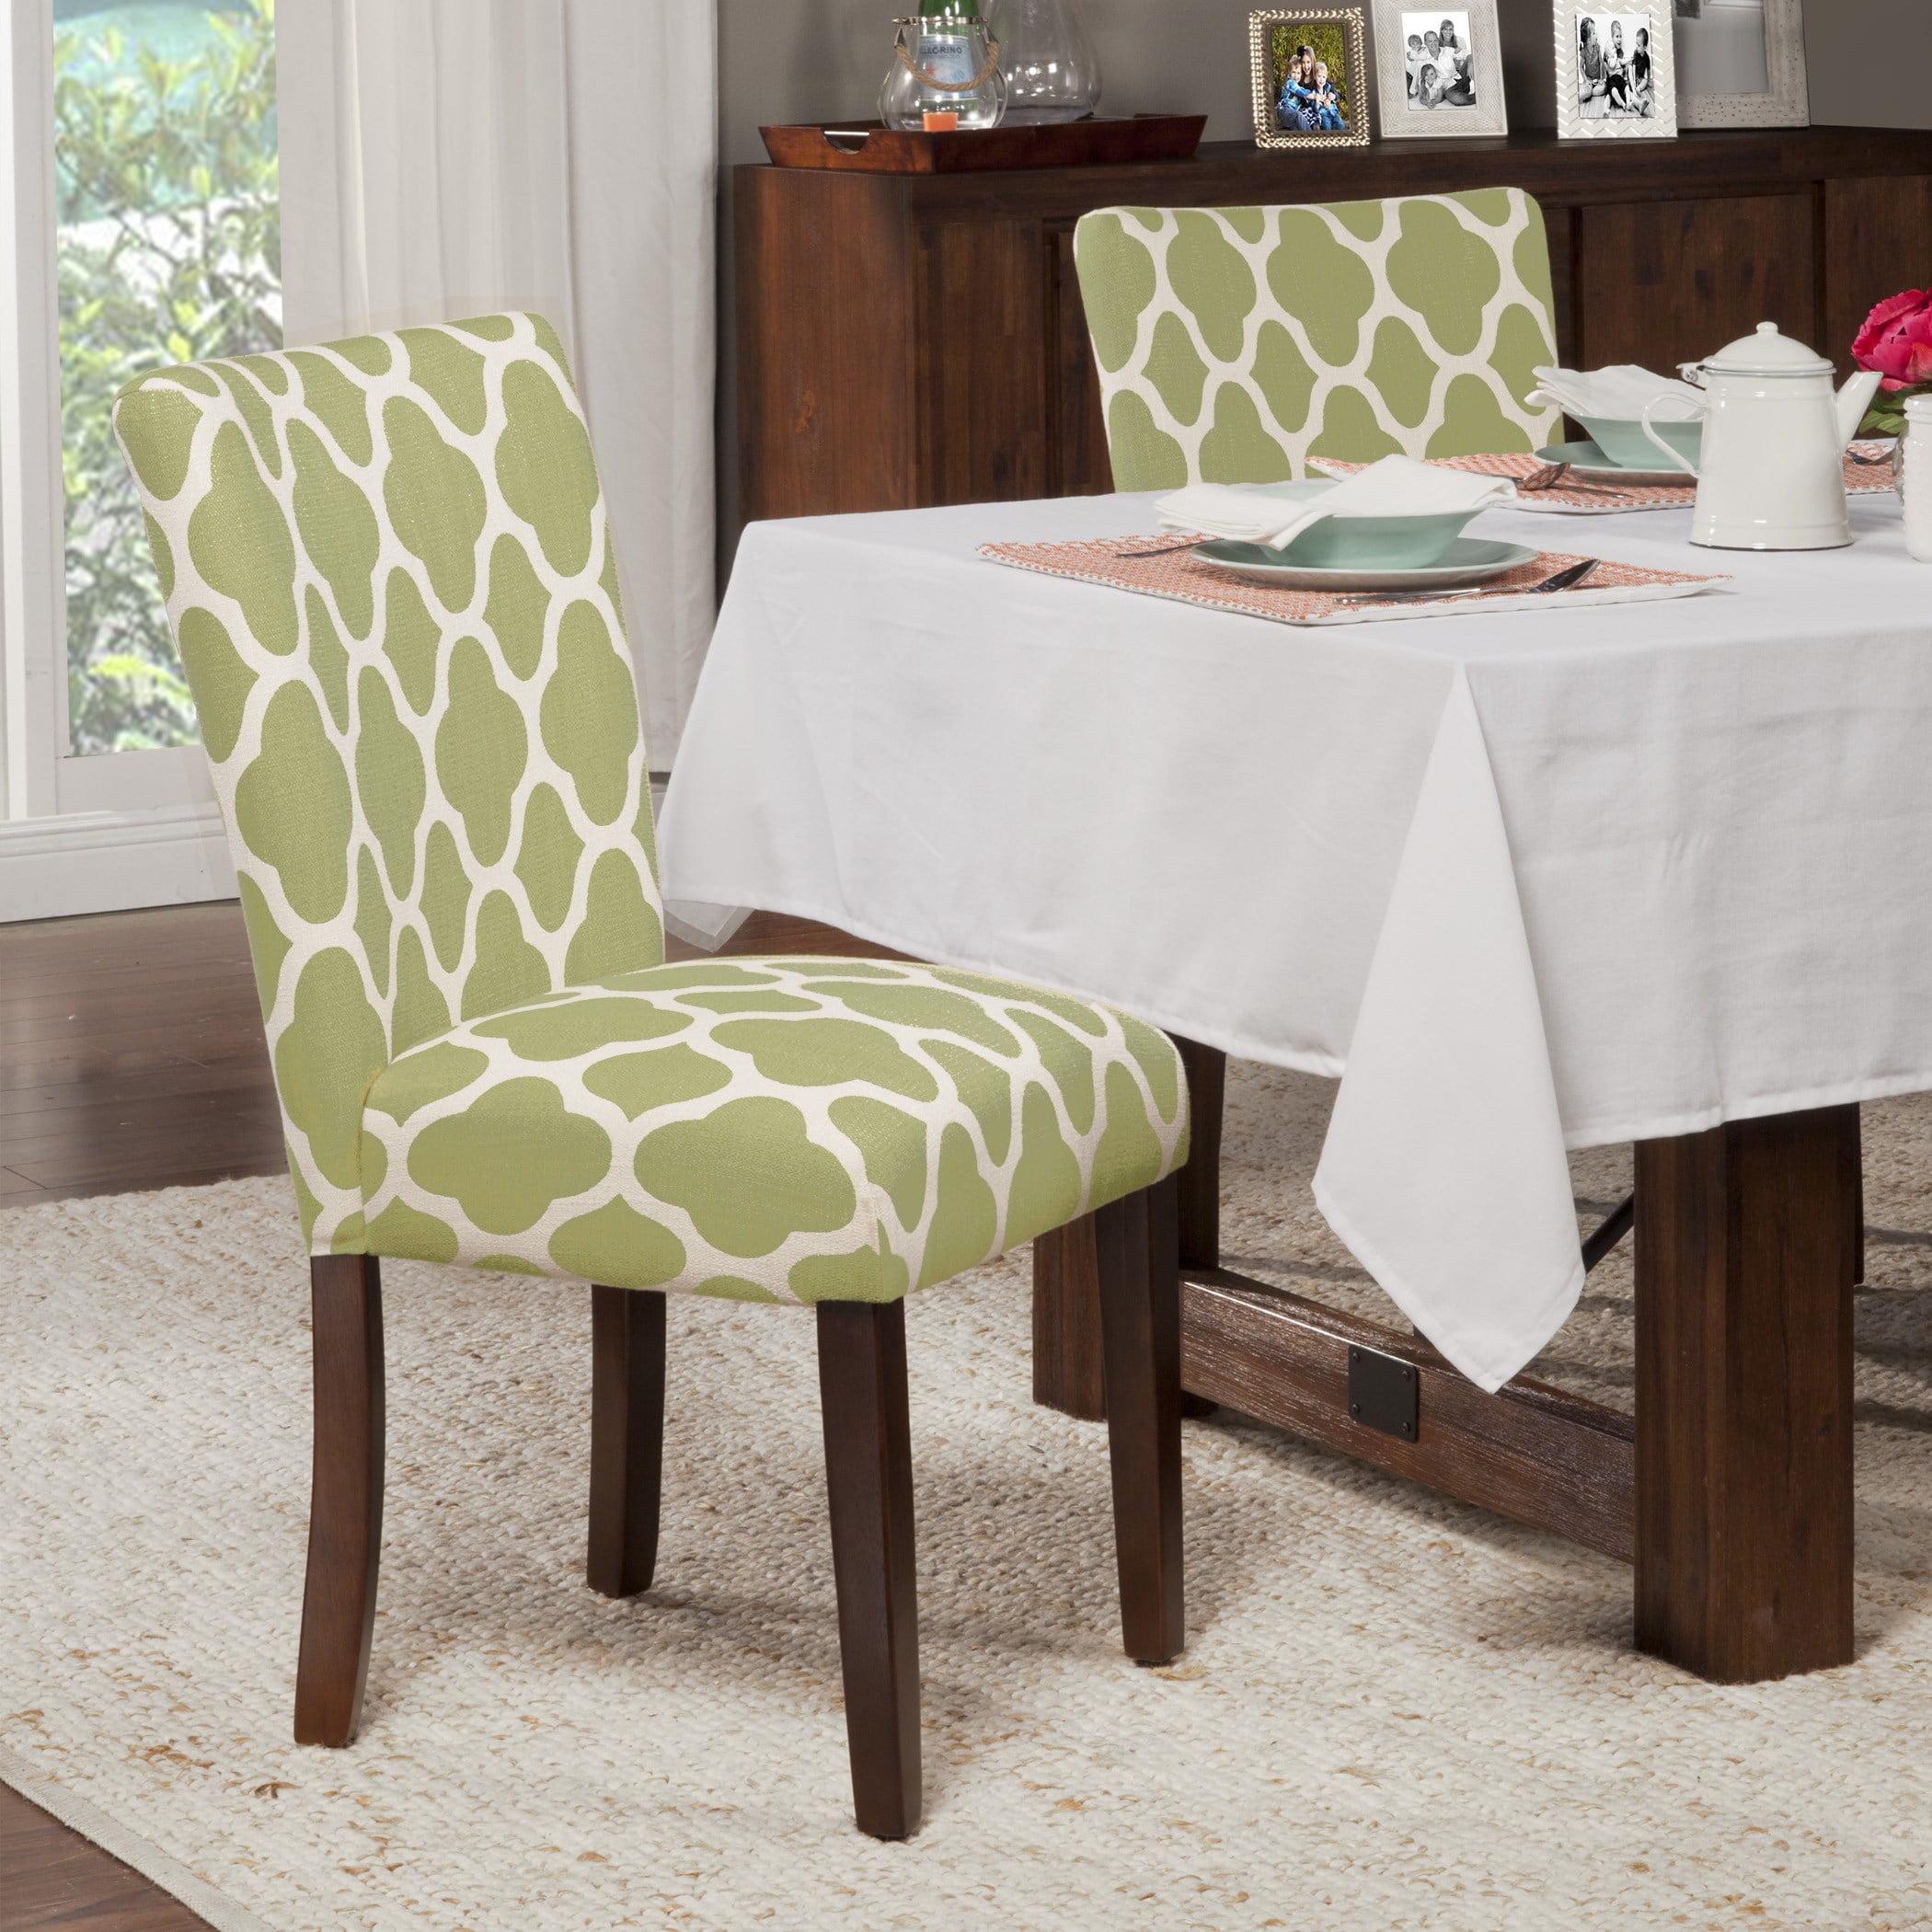 HomePop Parsons Dining Chairs (Set of 2), Quatrefoil